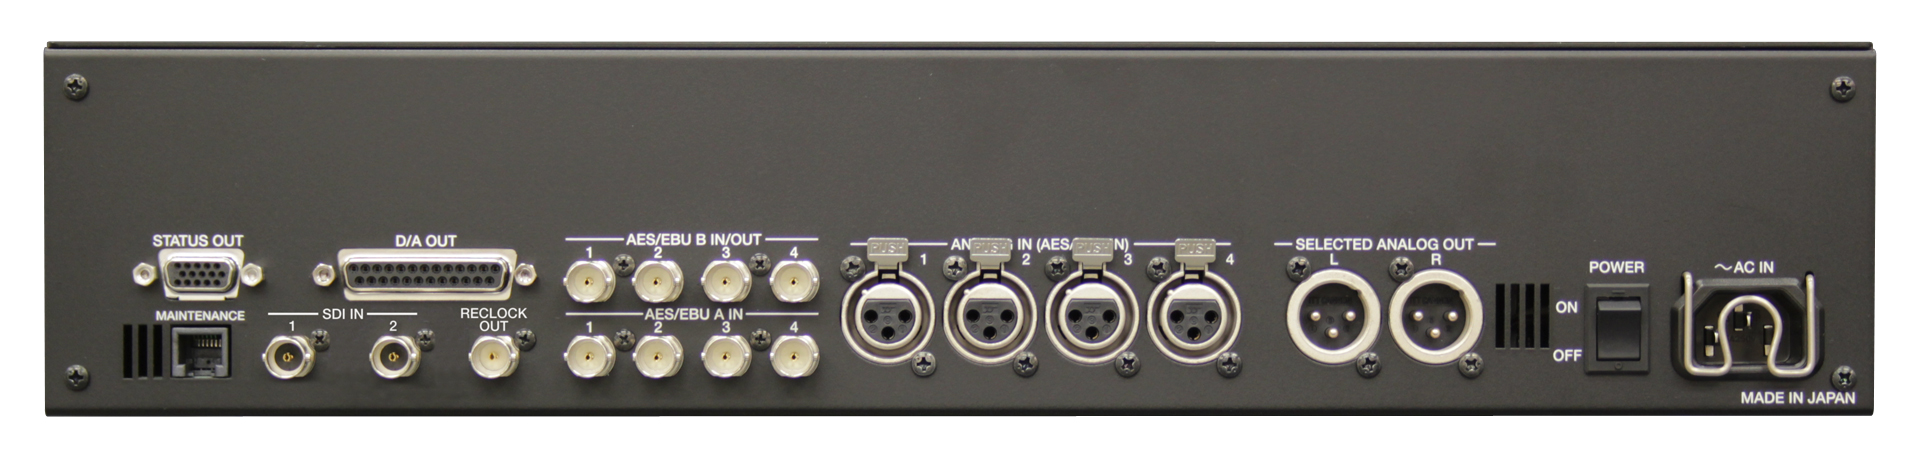 SP-VM2-12G-32_R